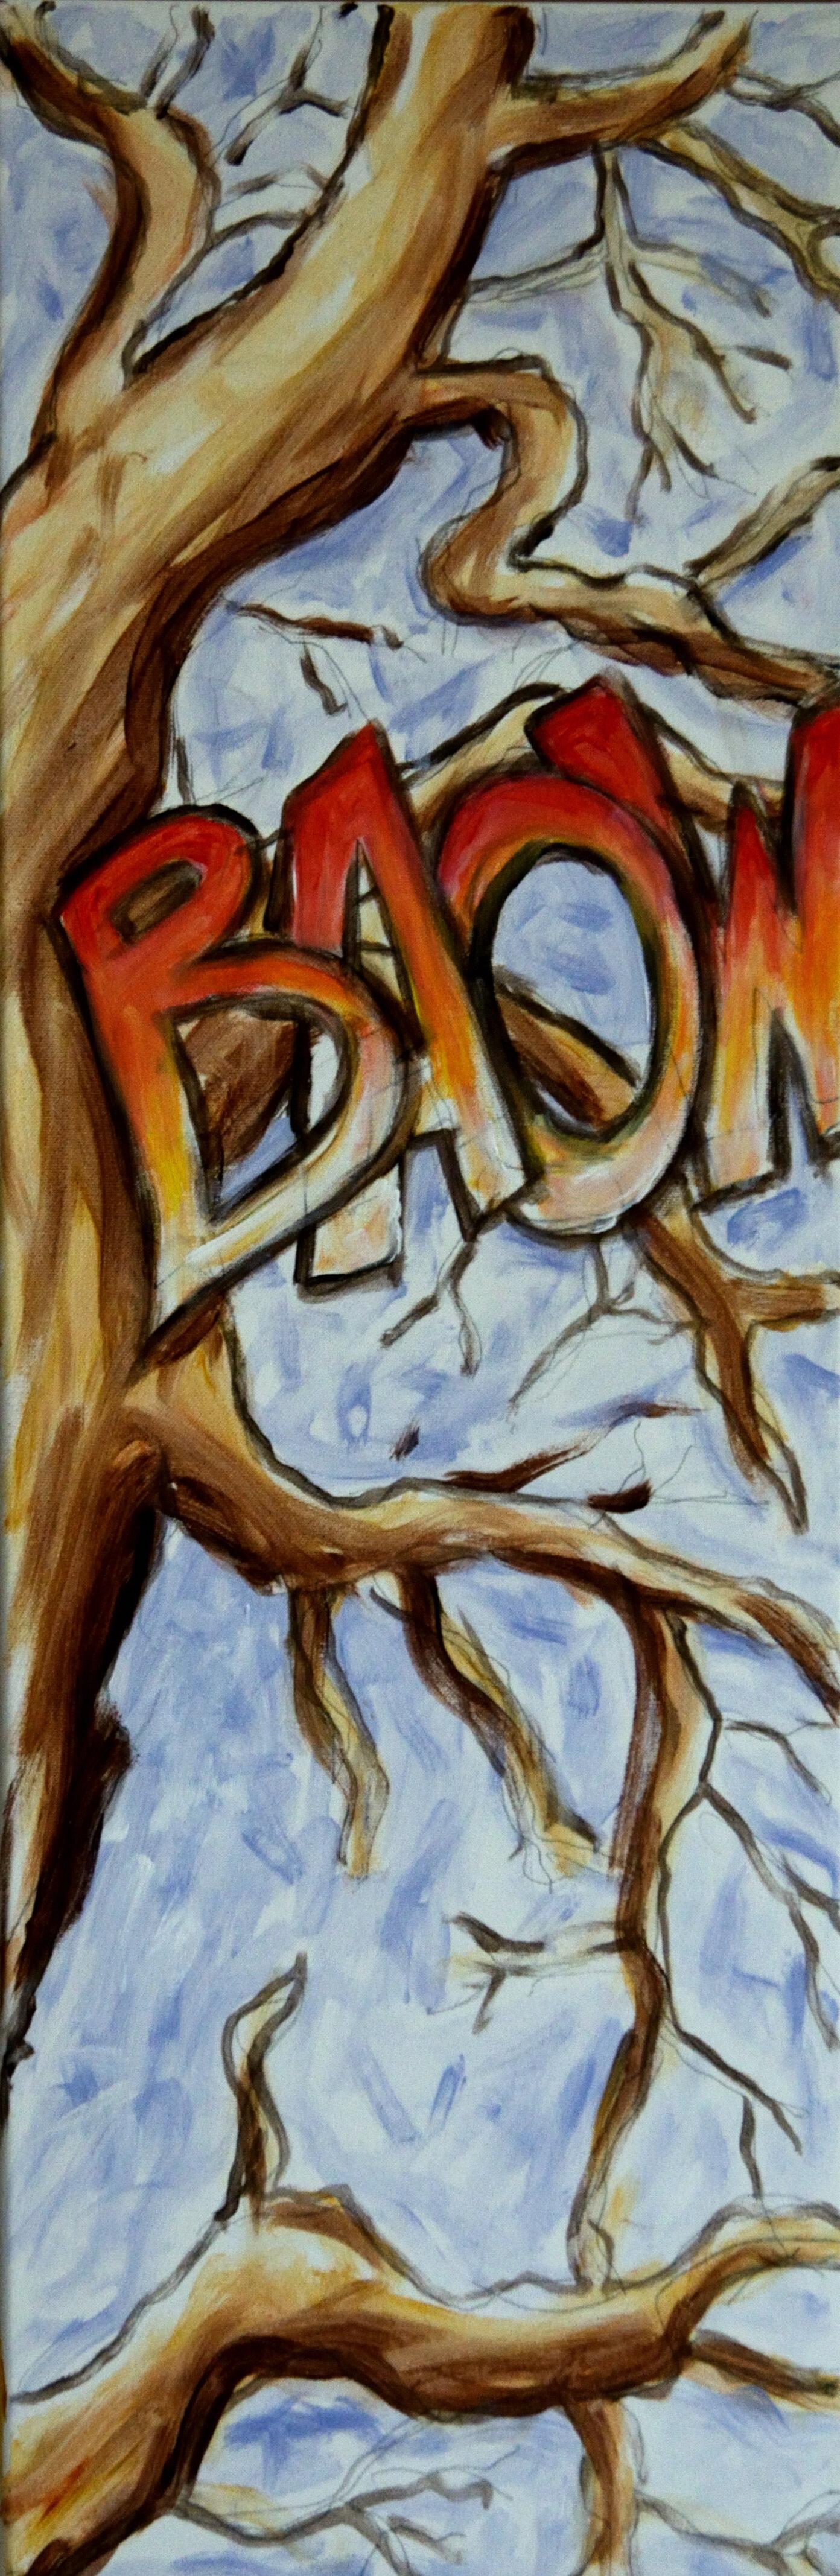 02. Study Death in Comics 1, acrylic on canvas, 90x30cm, 2019 .JPG